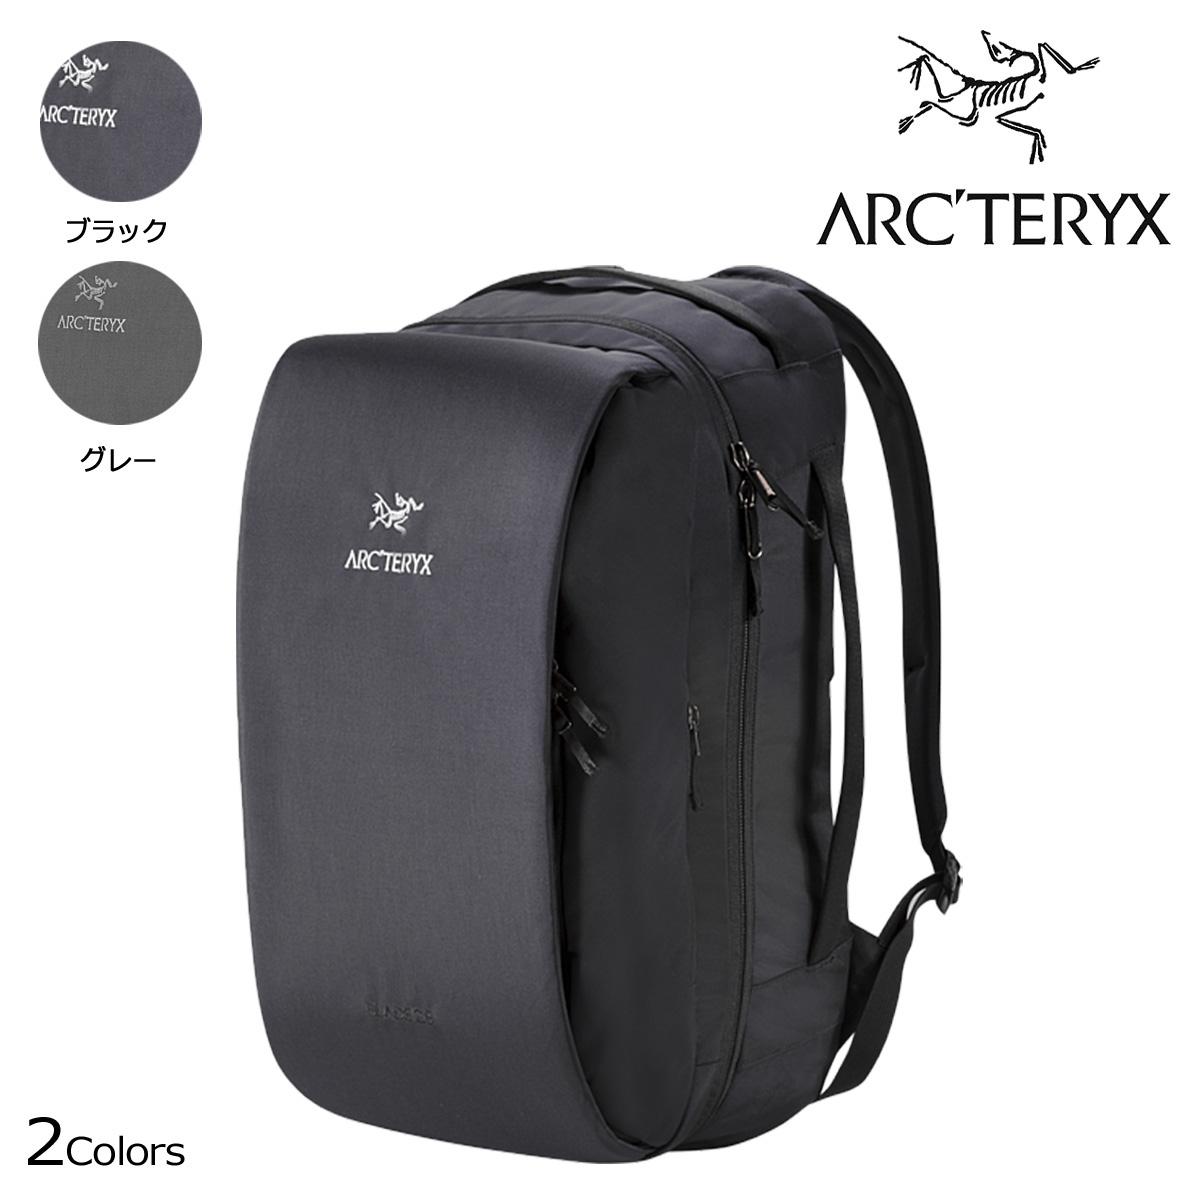 ARC'TERYX BLADE 28 BACKPACK アークテリクス リュック バックパック ブレード28 28L メンズ ブラック グレー [10/10 追加入荷]